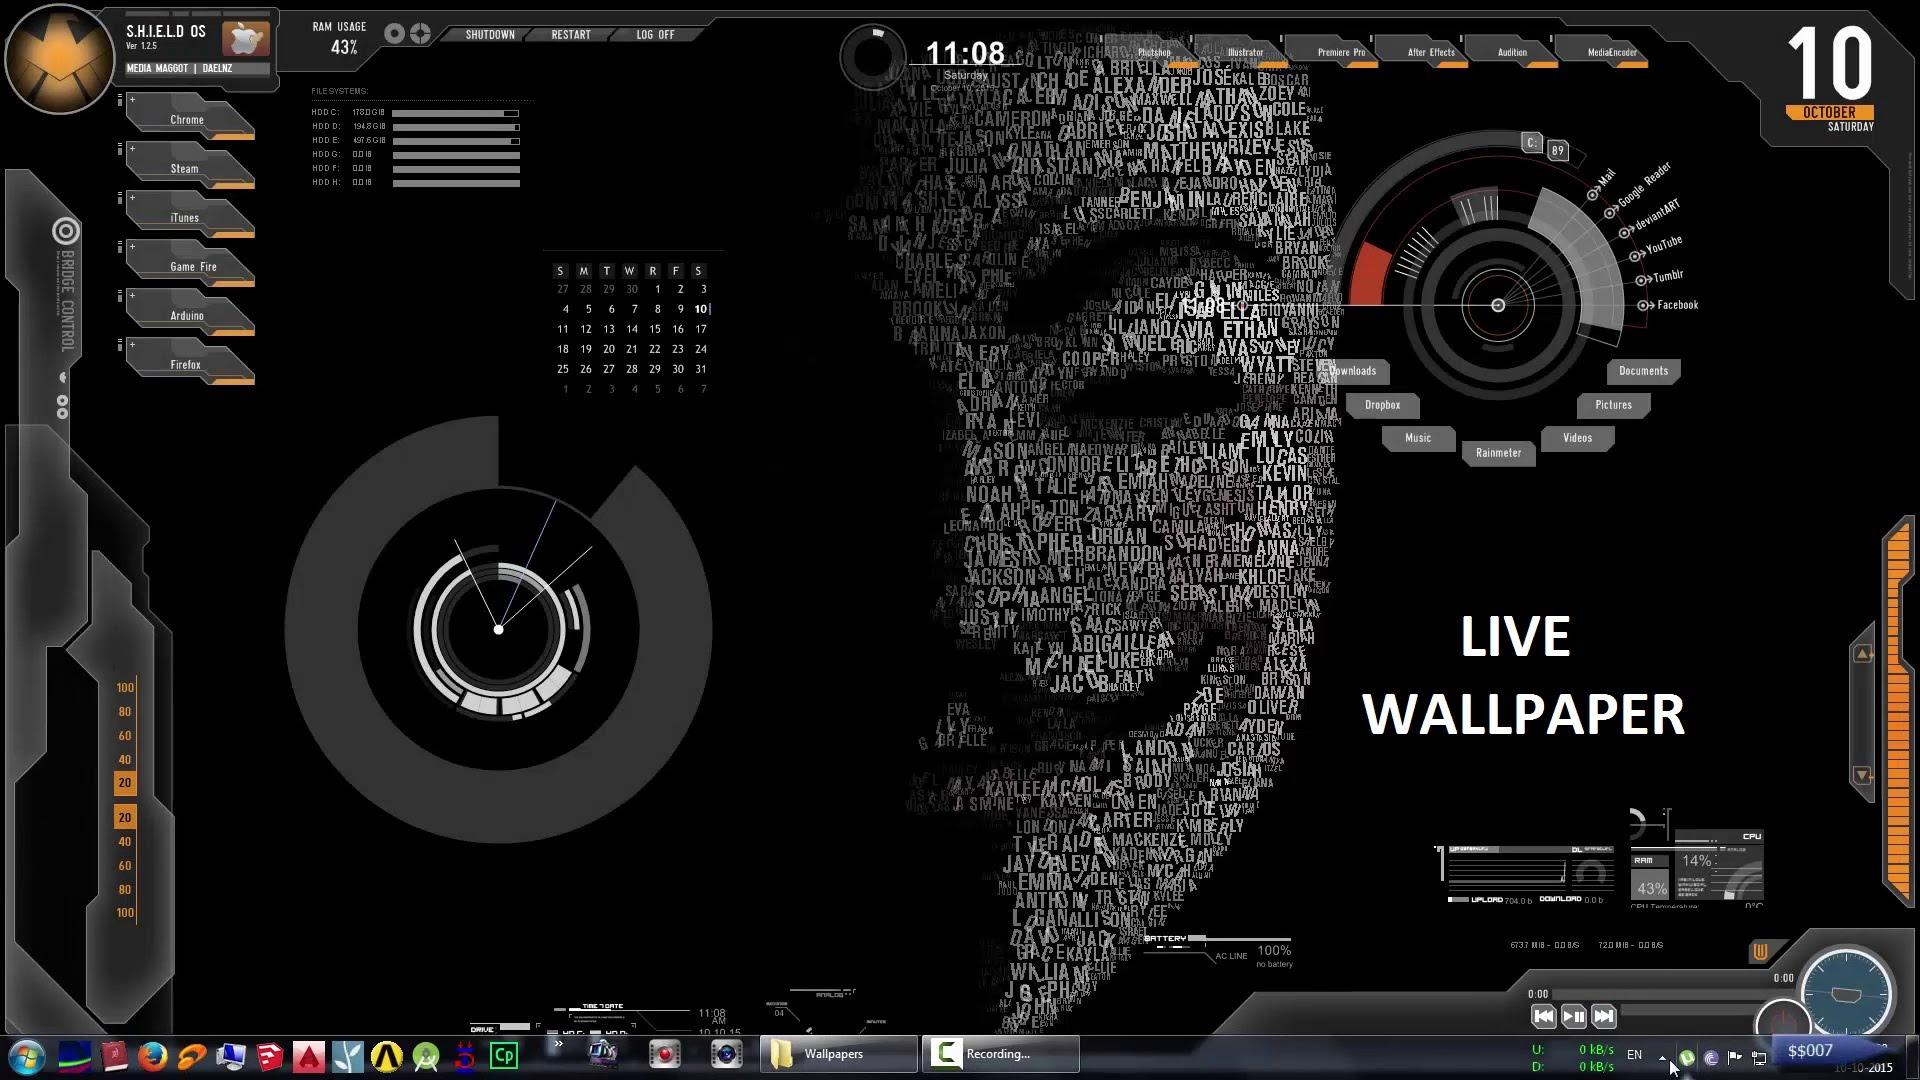 Letest Top10 Hate Love Wallpaper In Hd Or Widescreen: Windows 10 Wallpaper Hack